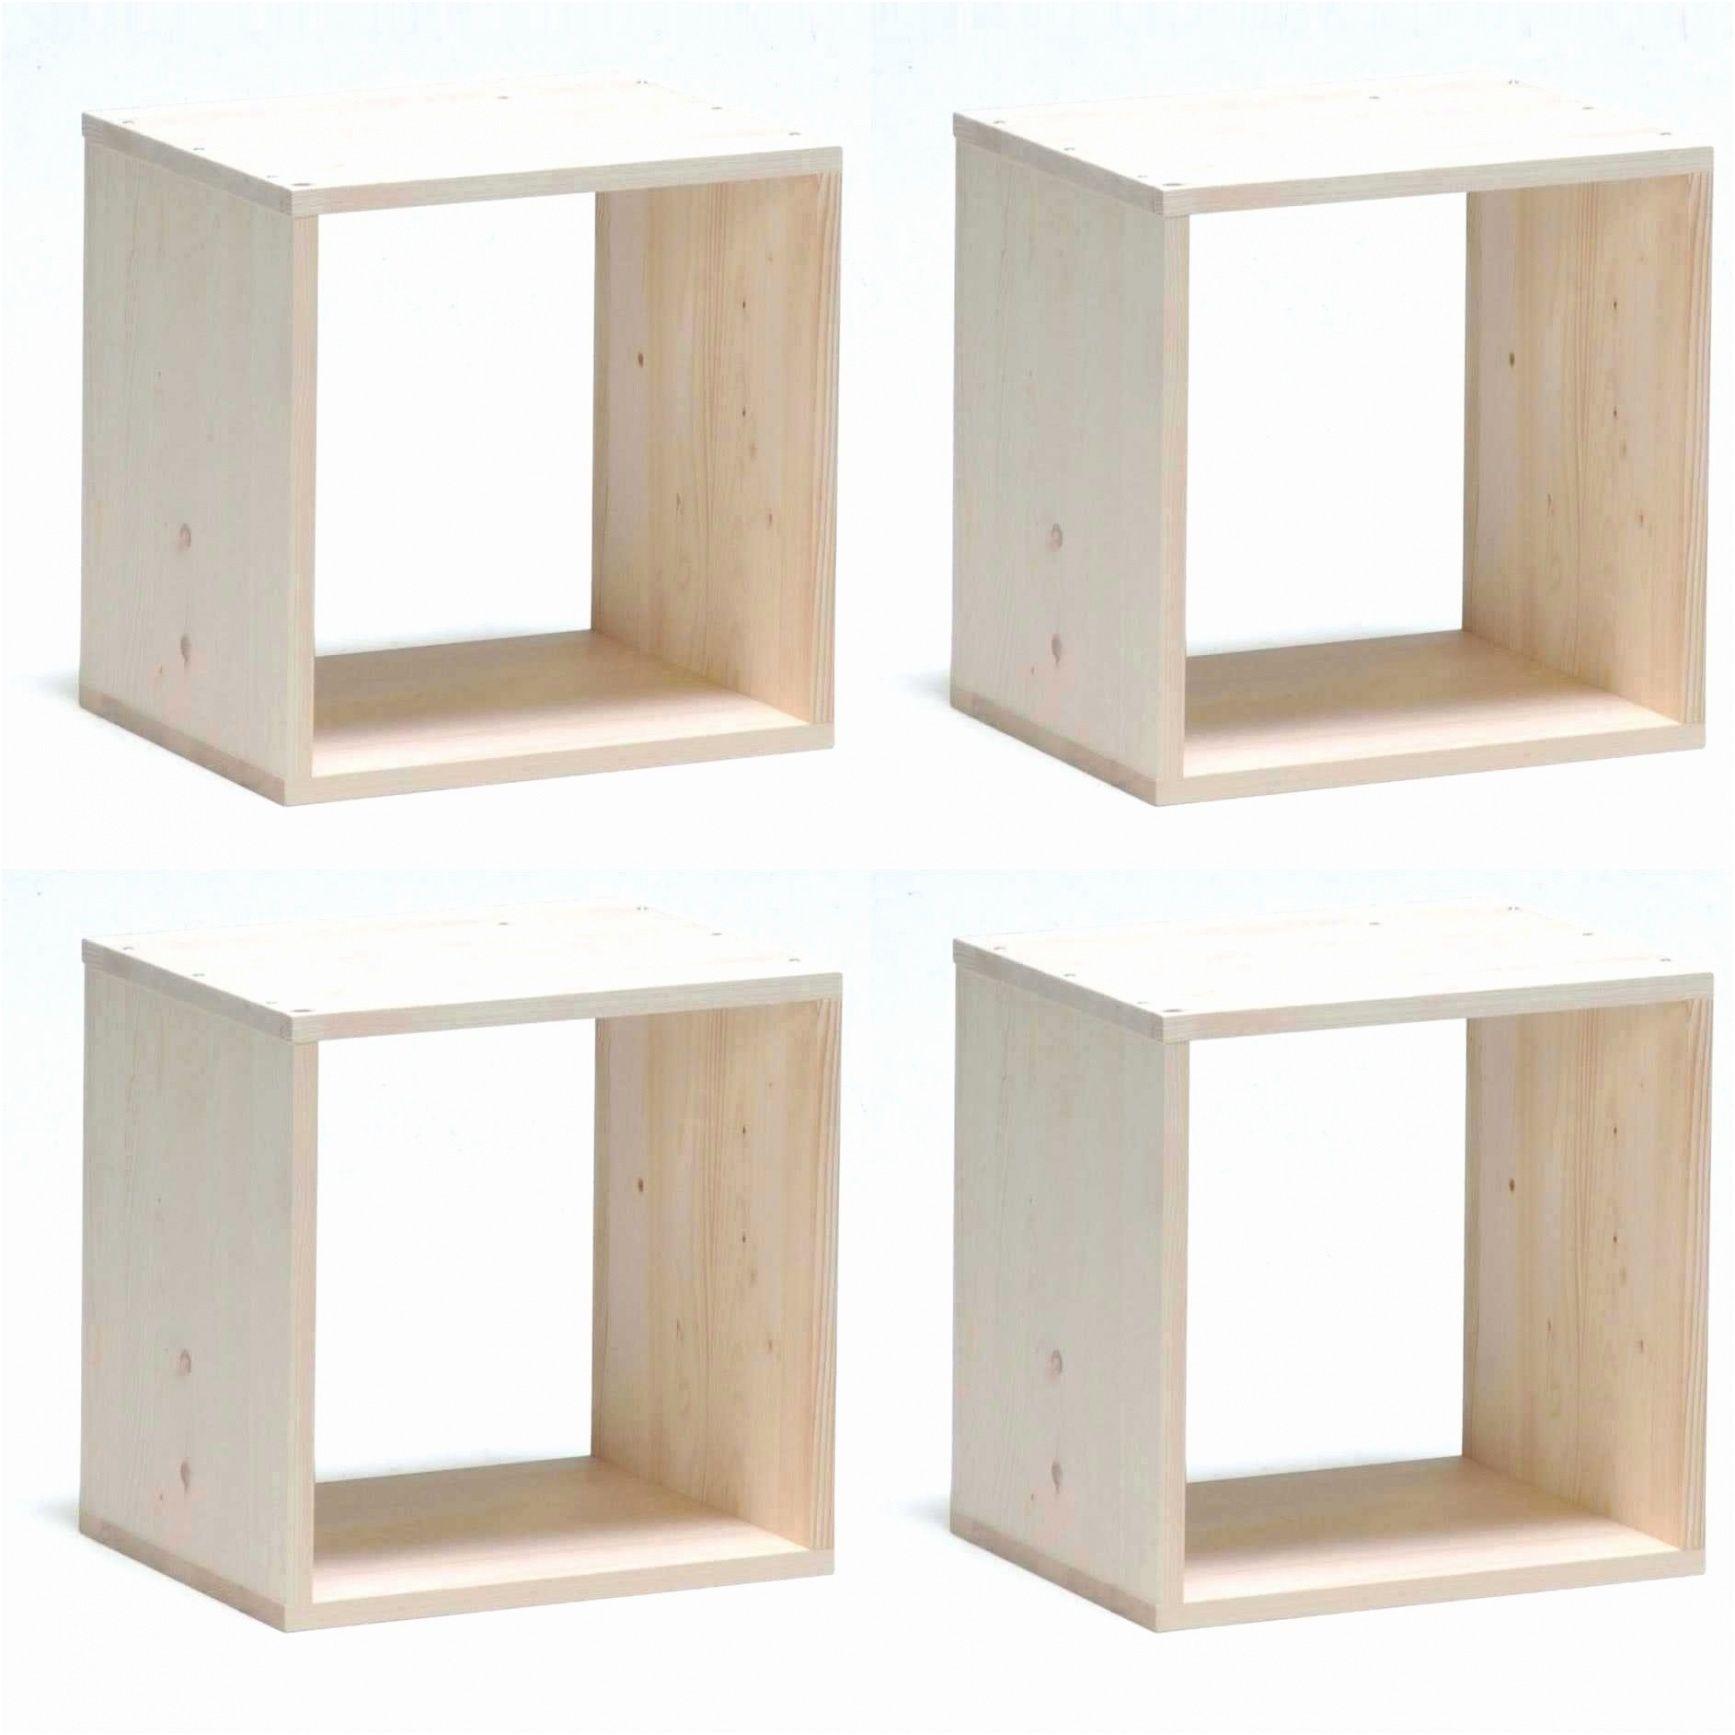 10 Remarquable Ikea Rangement Bureau Photos